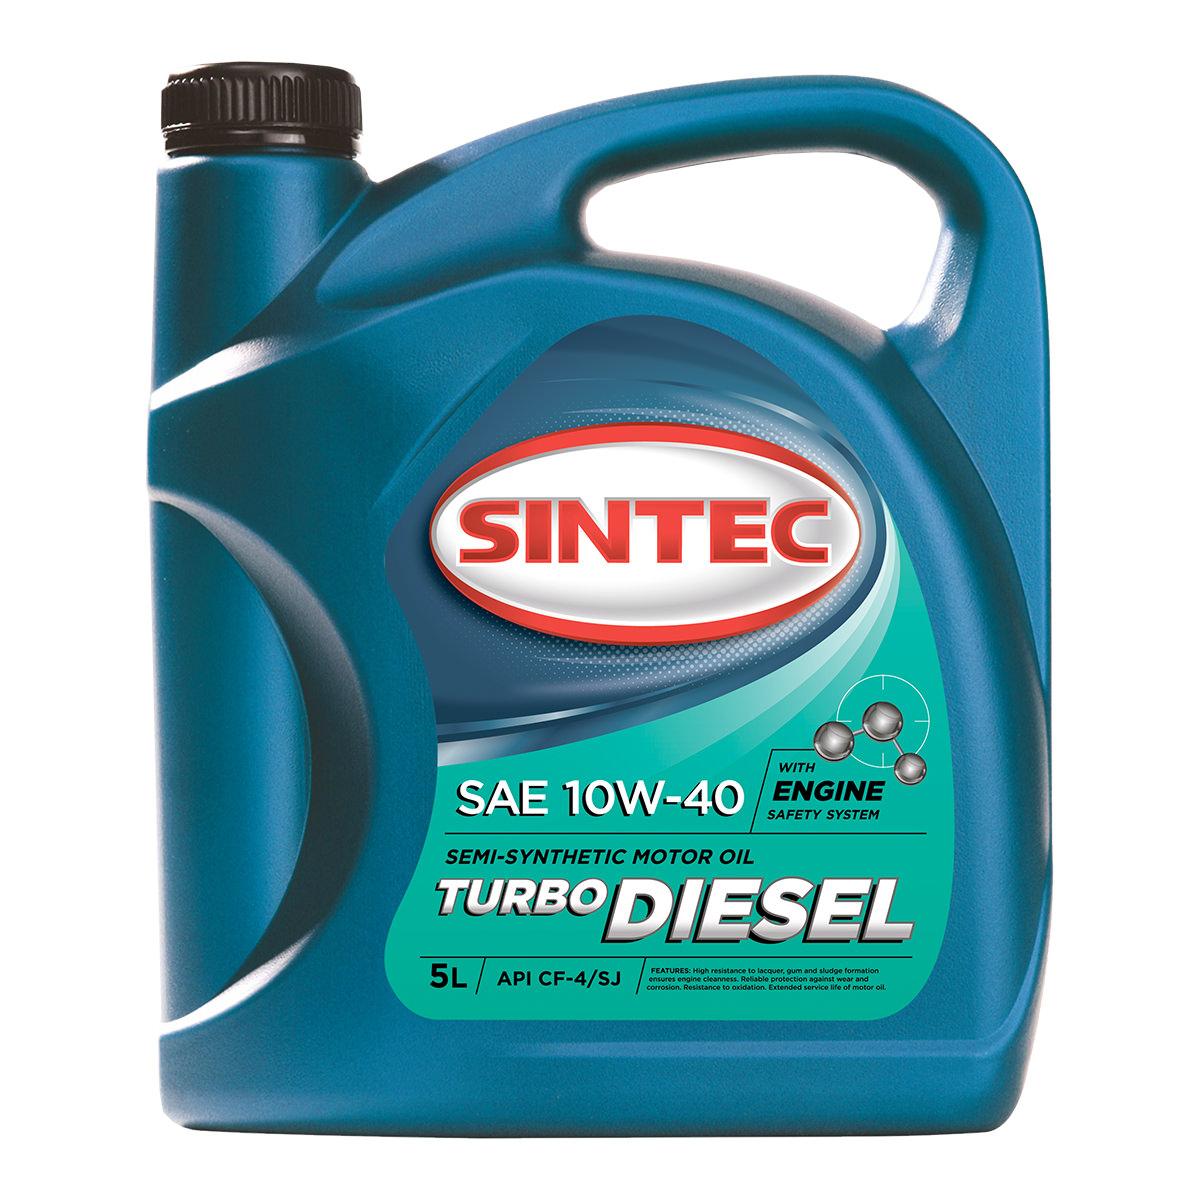 SINTEC TURBO DIESEL SAE 10W-40 API CF-4/CF/SJ